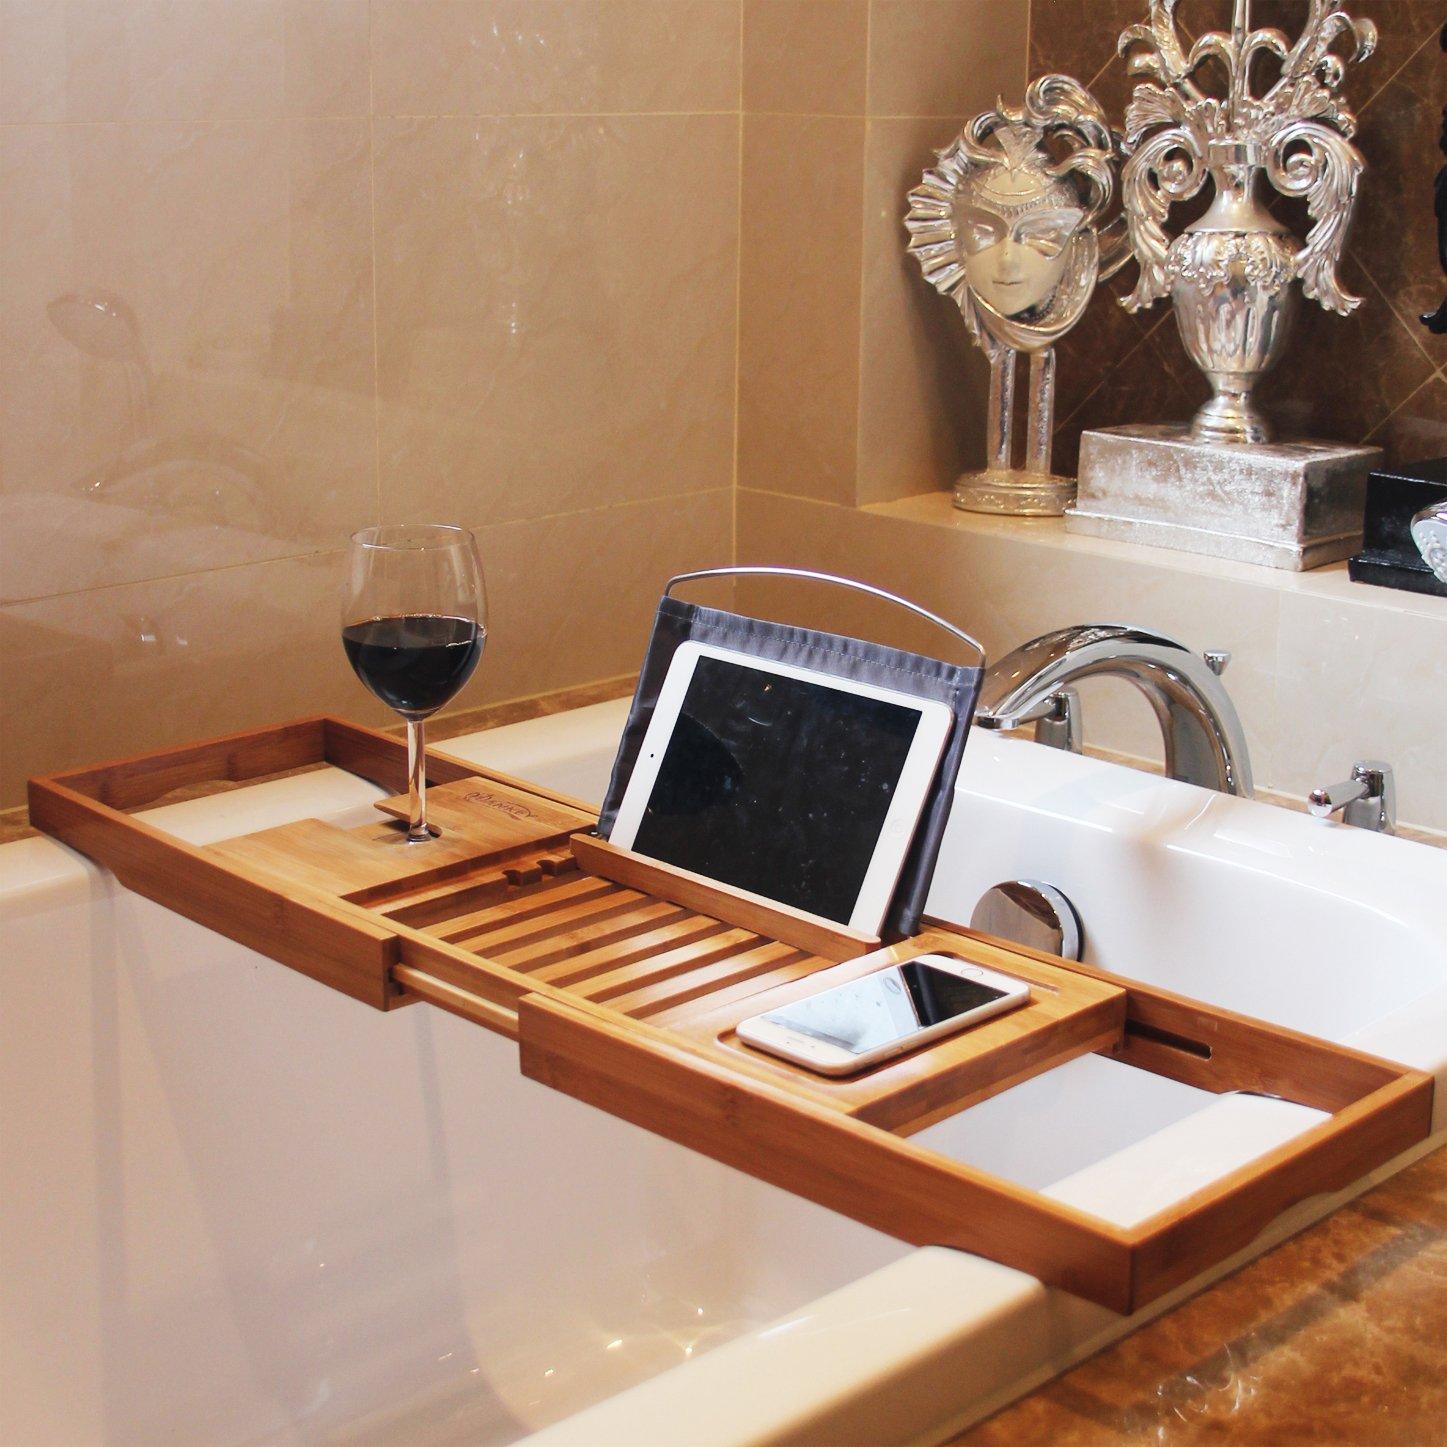 HANKEY Bamboo Bathtub Caddy Tray (Extendable) Luxury Spa Organizer ...